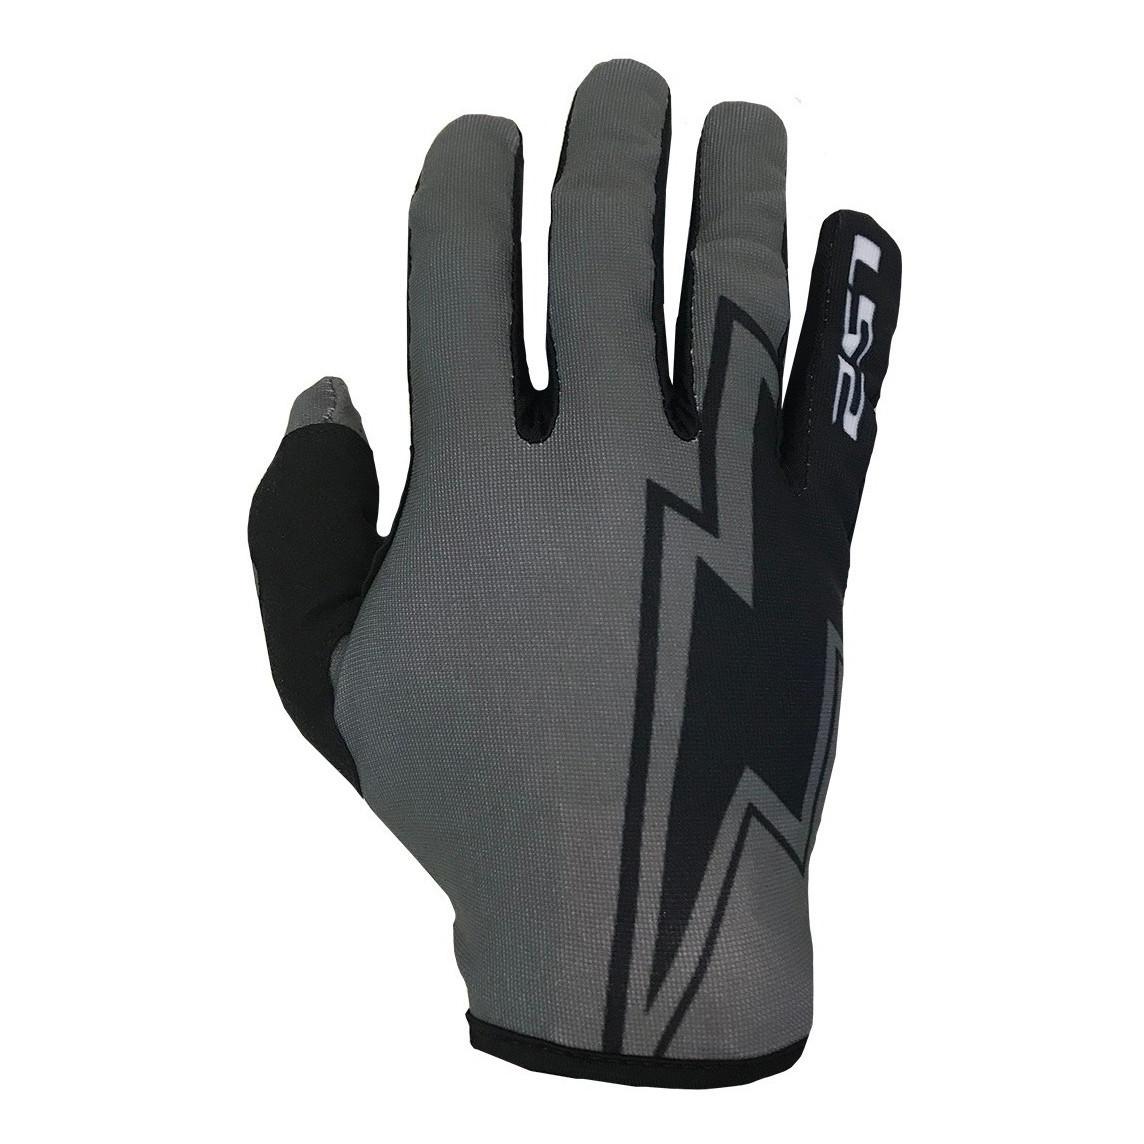 Guantes de Motocross Ls2 Ranger Flash MX Negro Gris